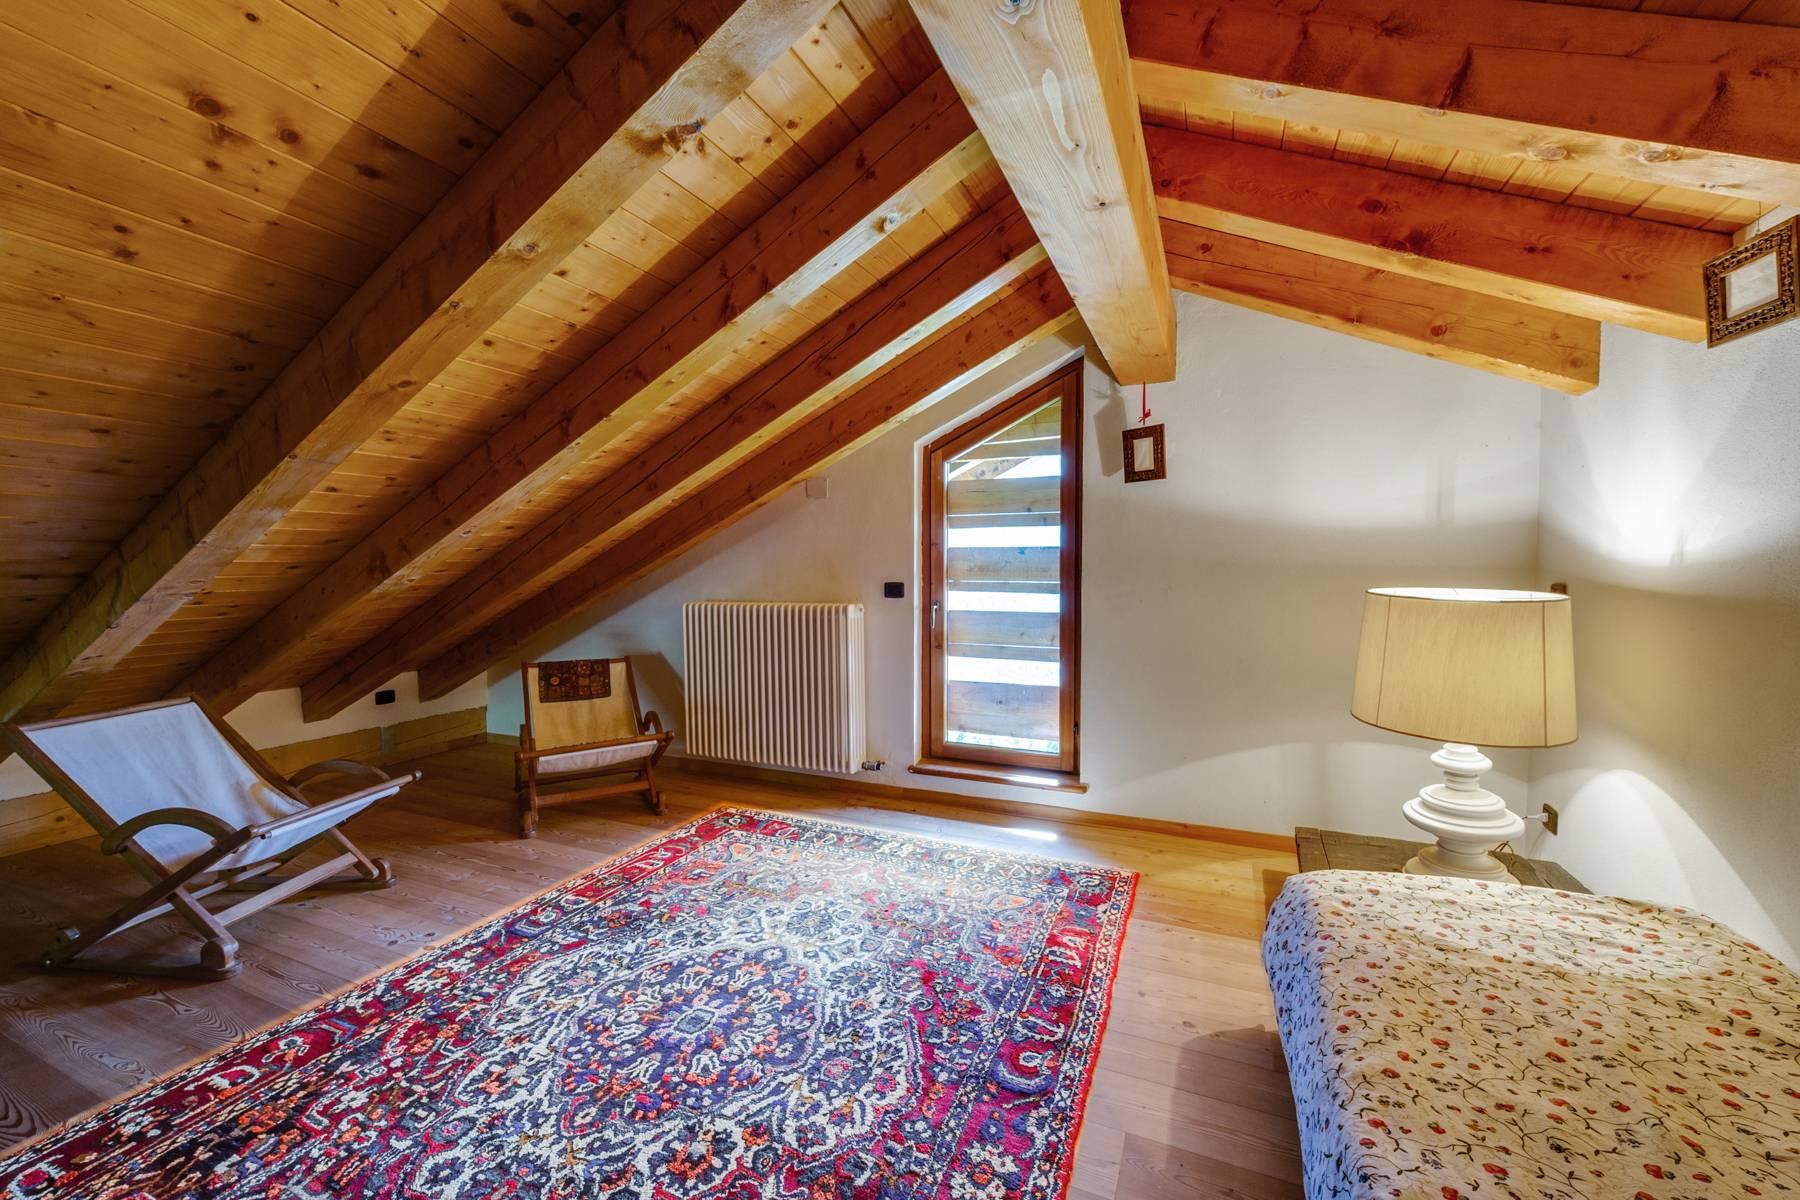 Villa in Vendita a Cogne: 5 locali, 377 mq - Foto 13